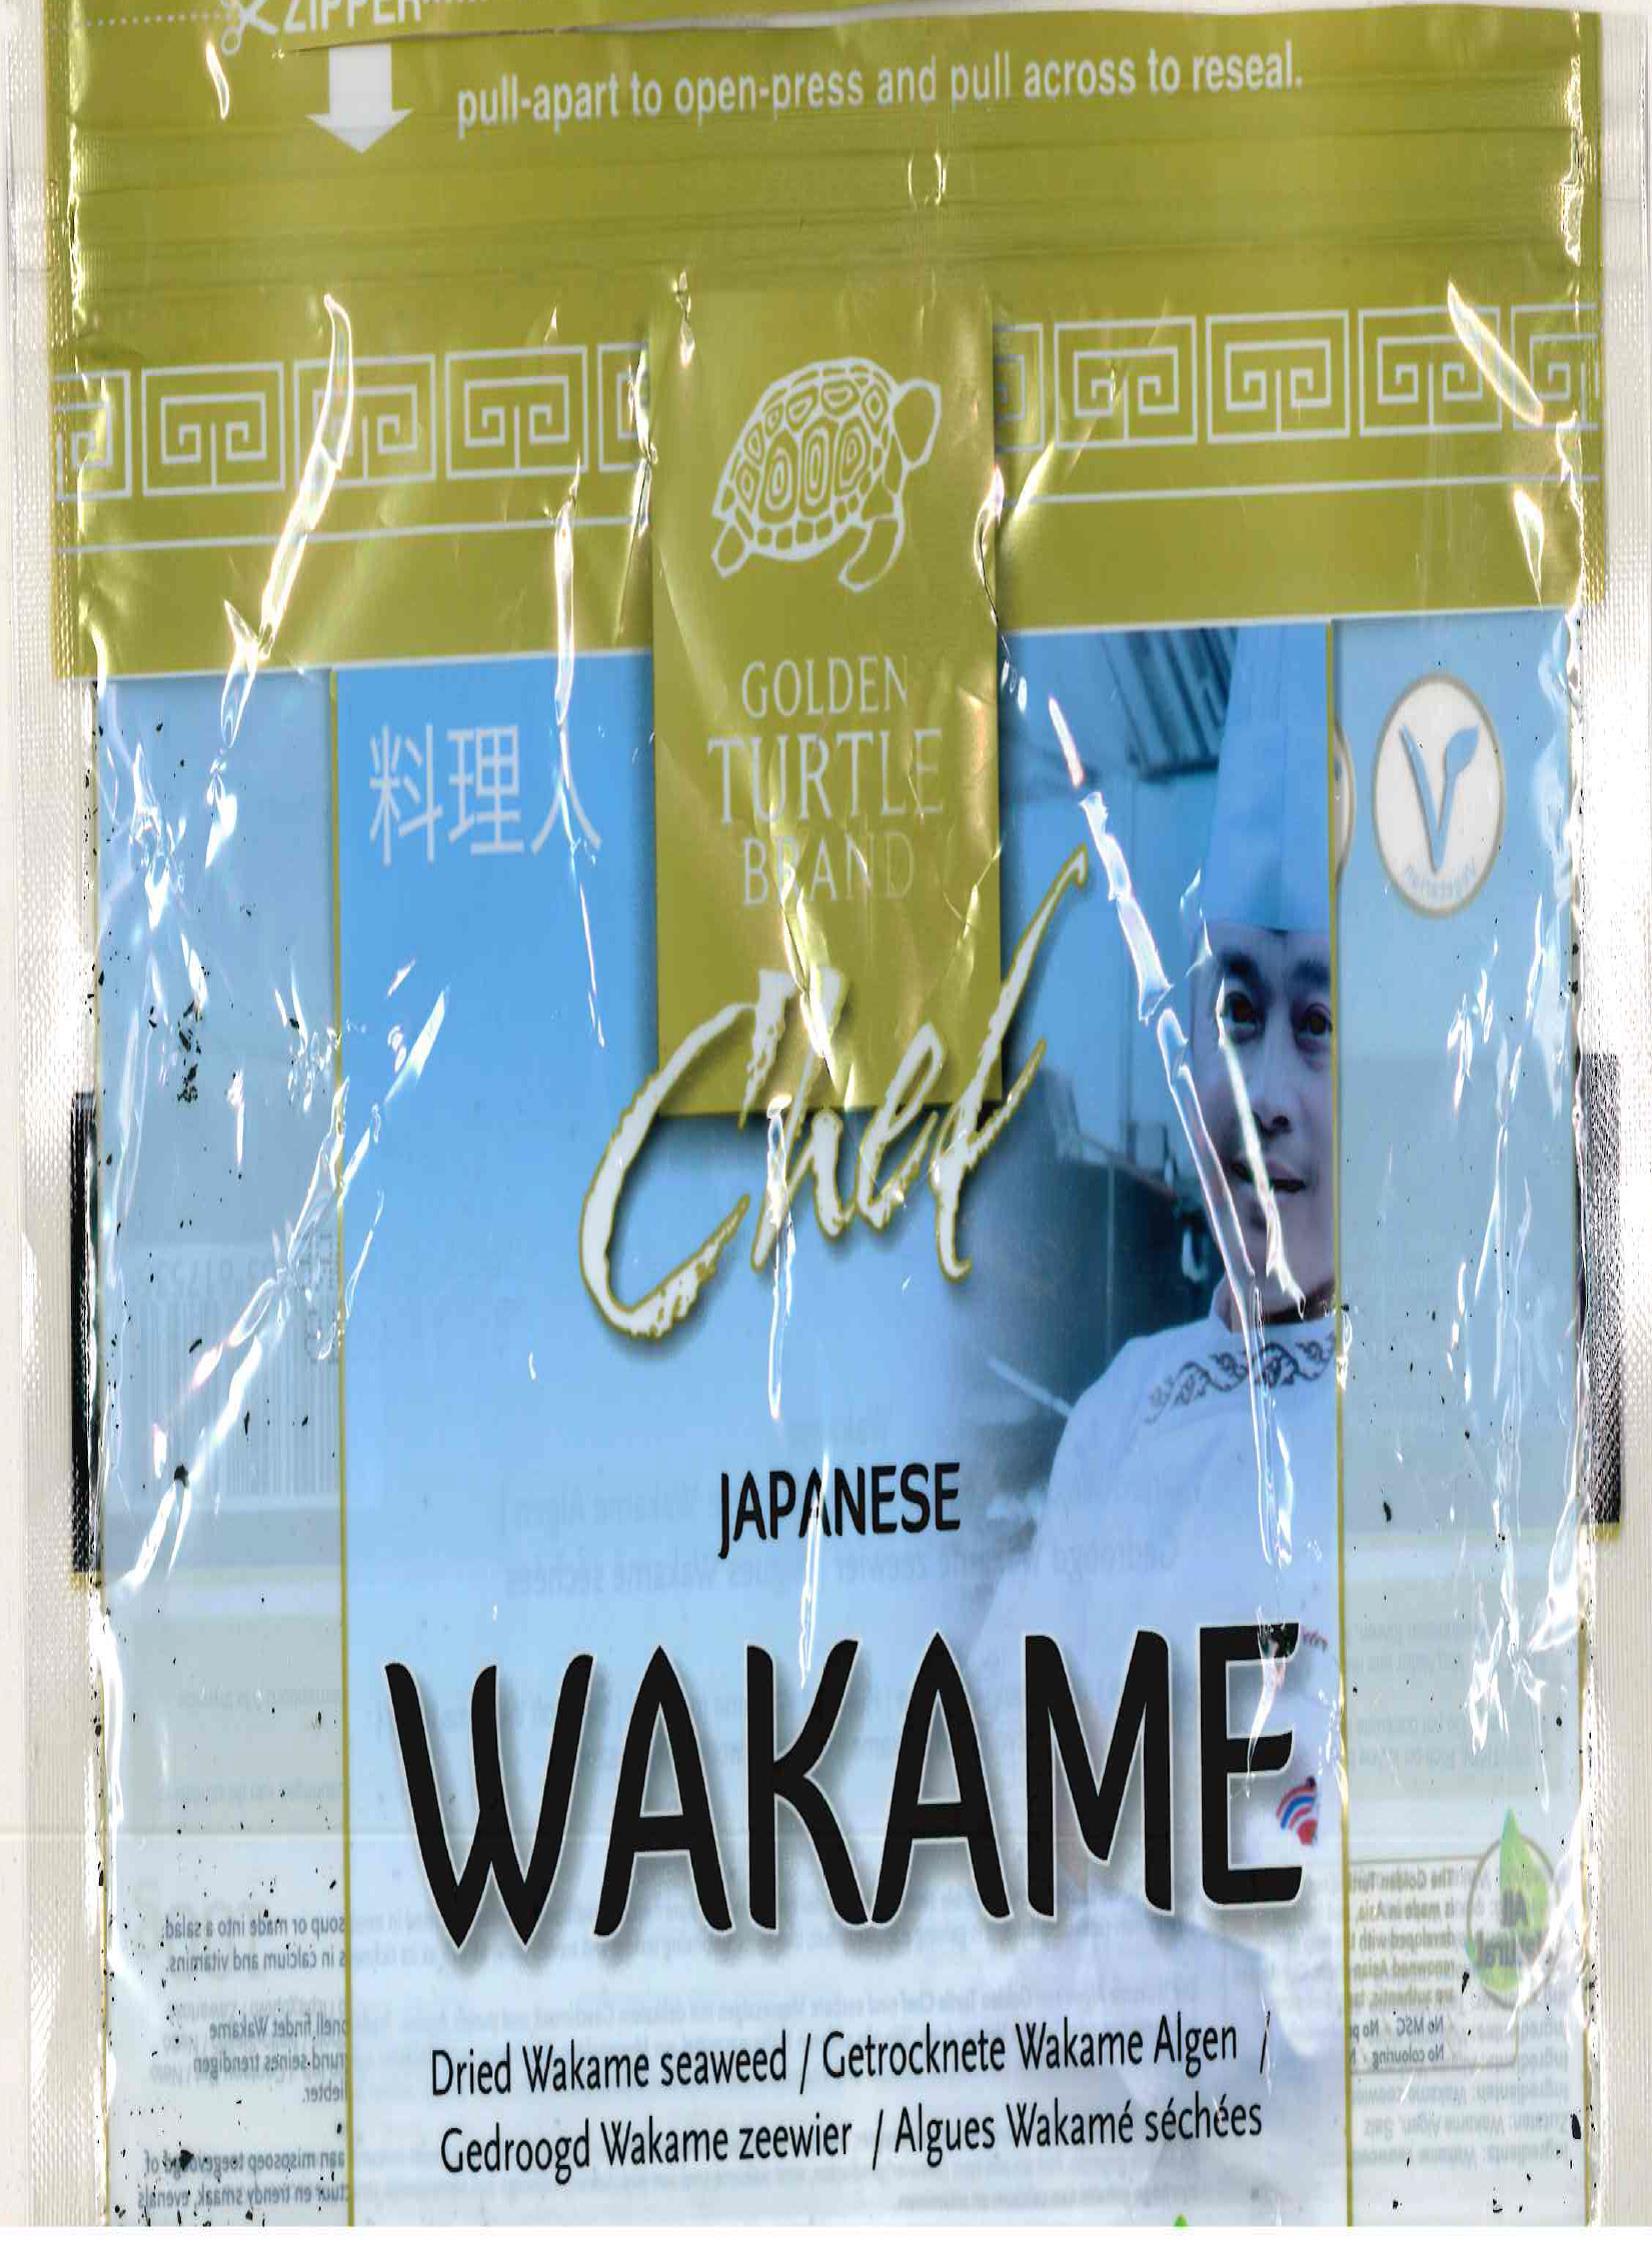 Marke: Chef Japanese Wakame; getrocknete Wakame Algen